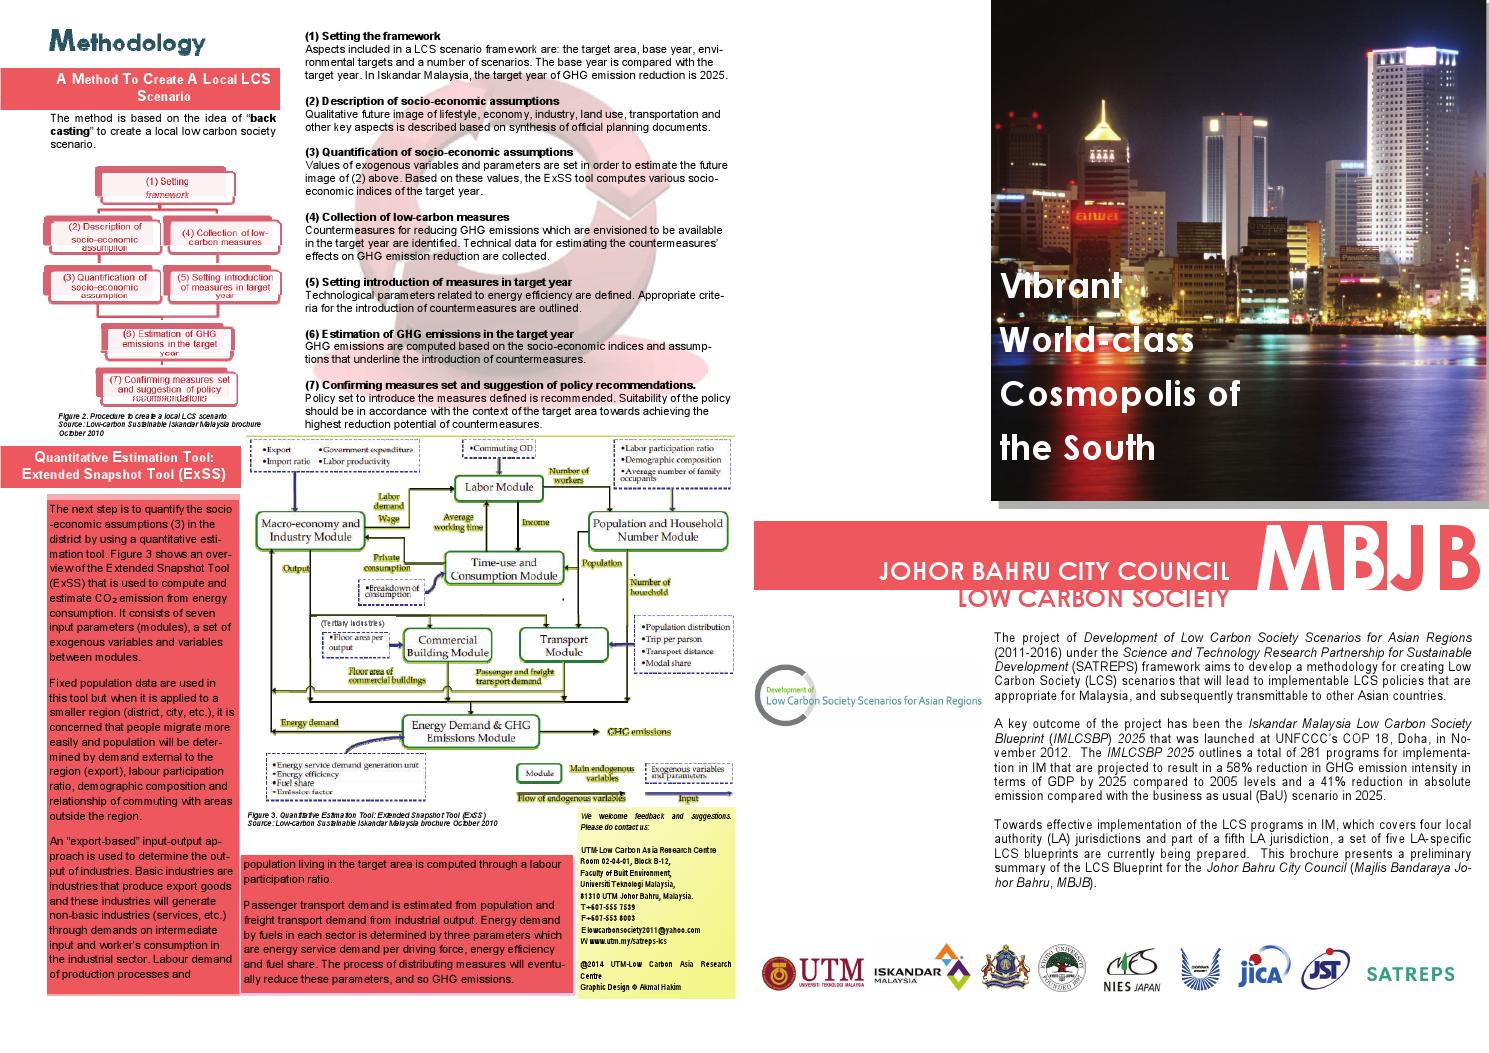 Johor bahru city council mbjb by universiti teknologi malaysia issuu malvernweather Gallery